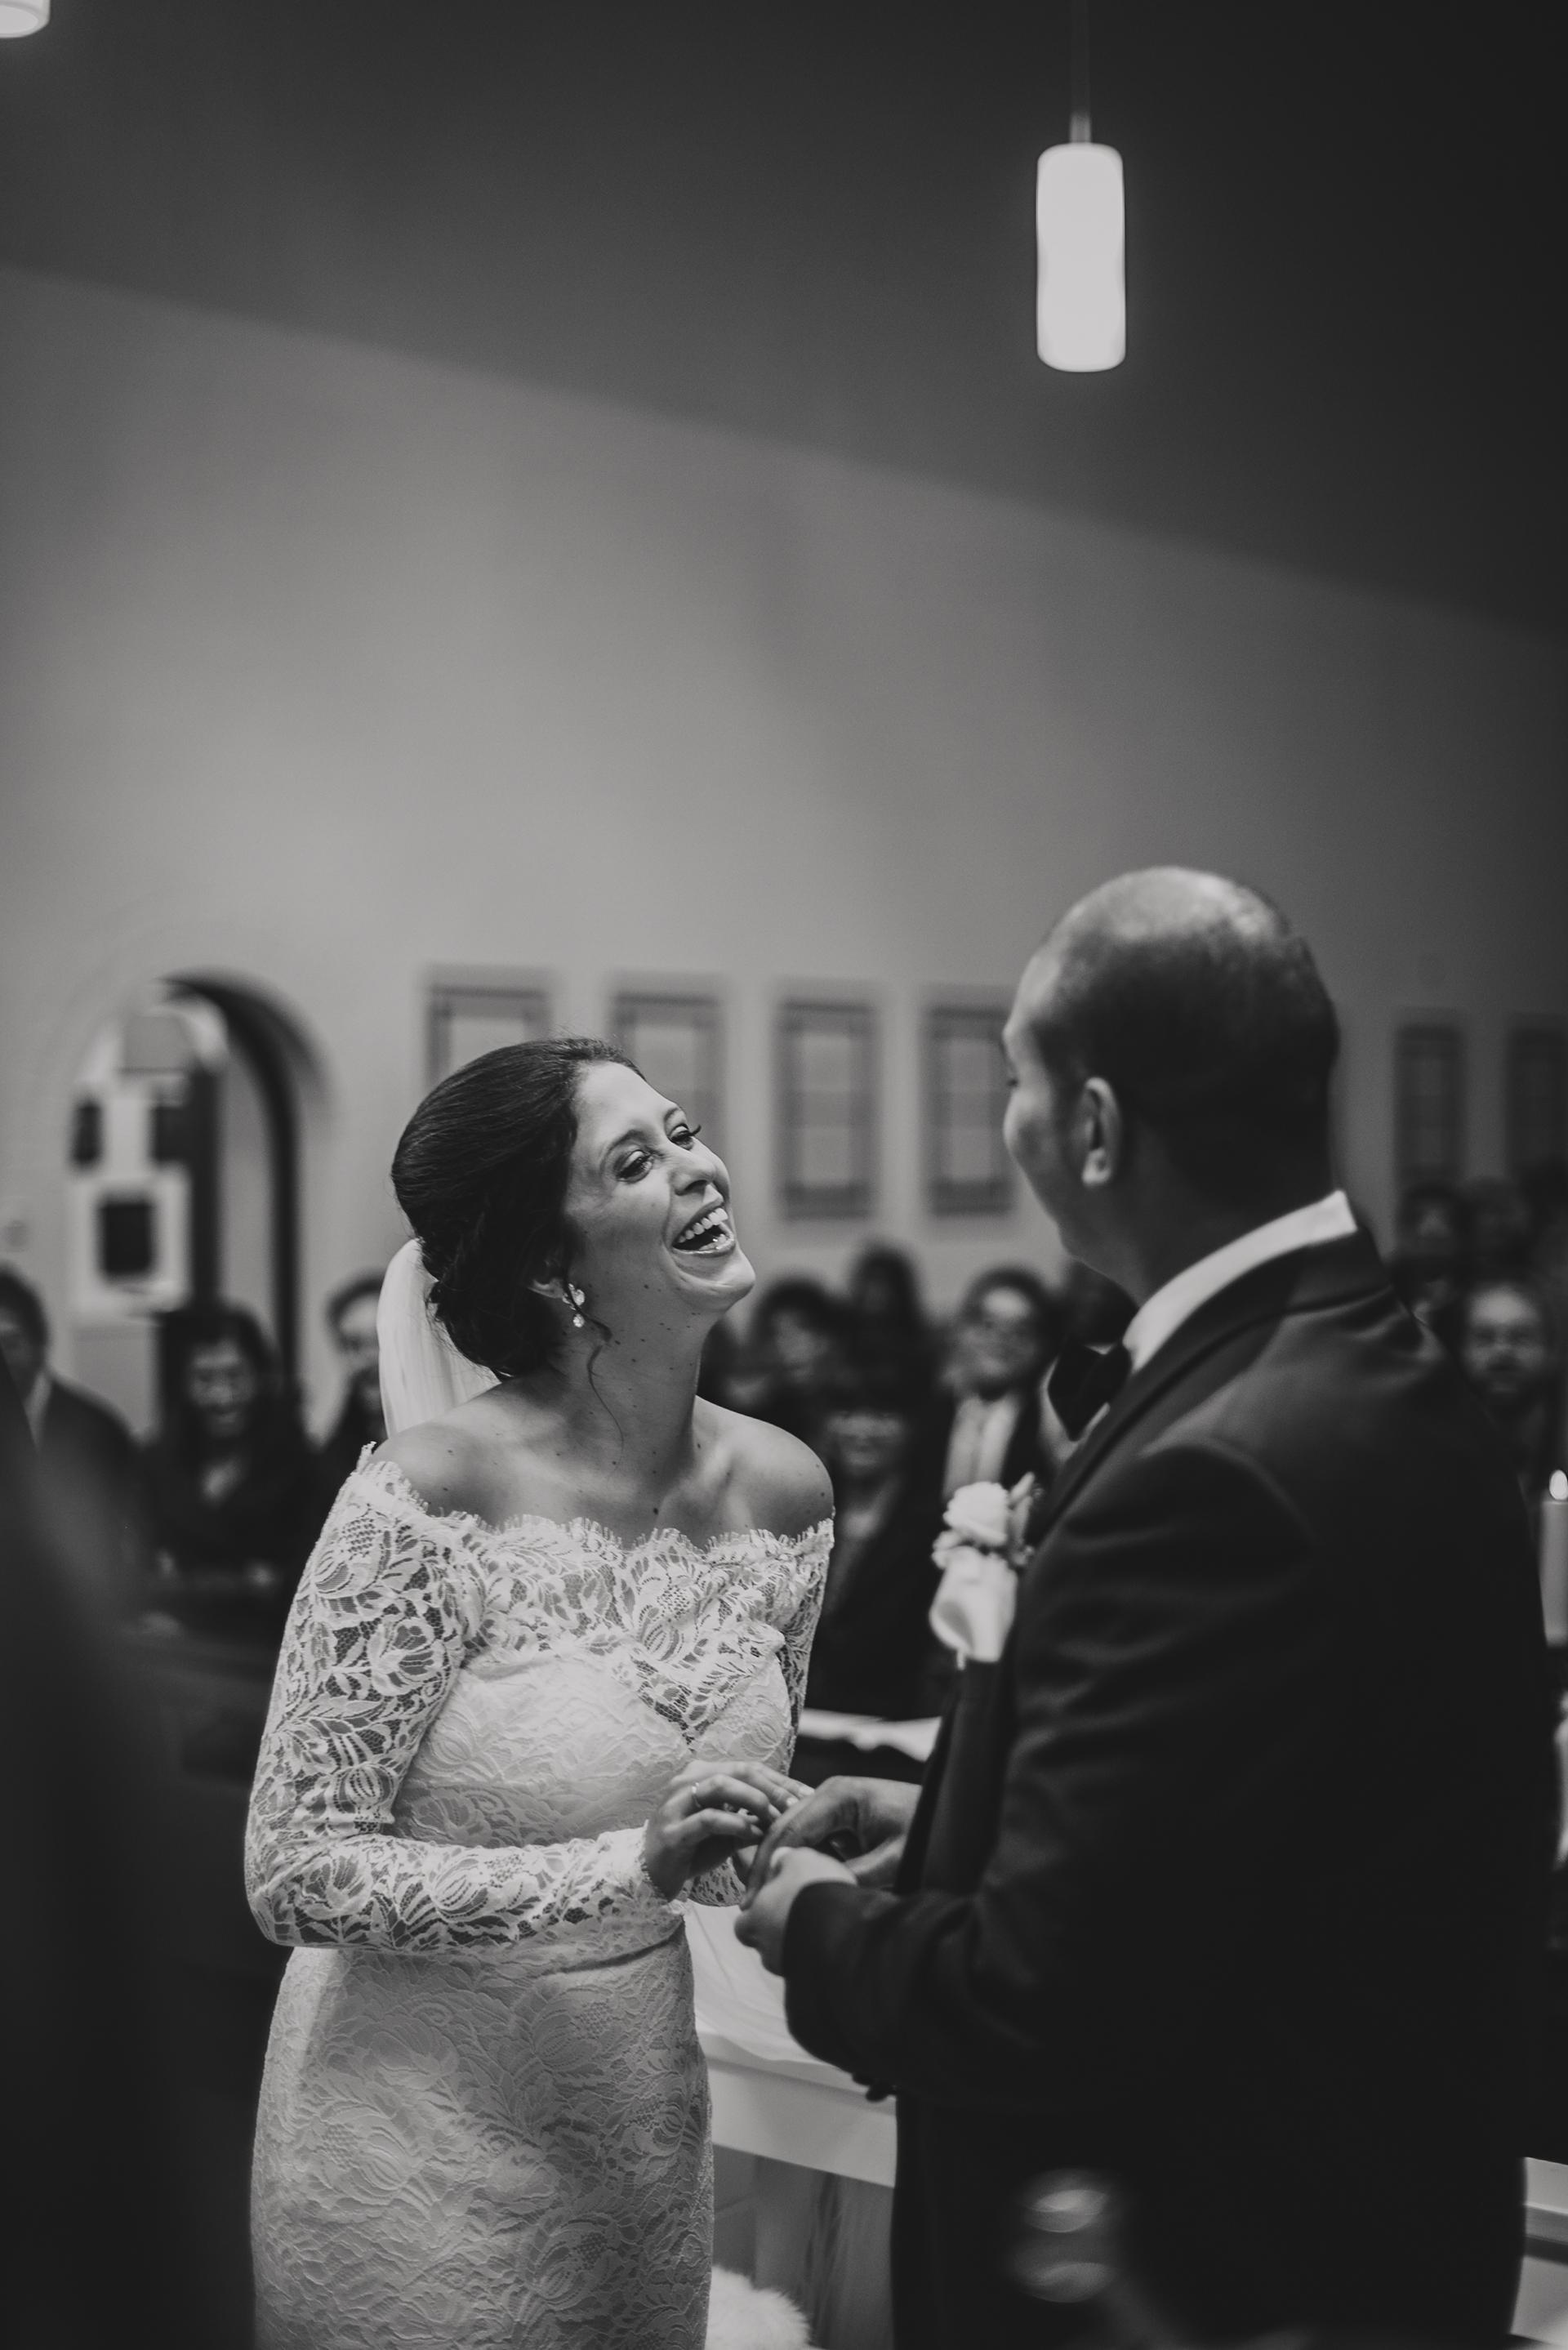 Hochzeitsreportage_J&D_023_Caroline Queda Fotografie